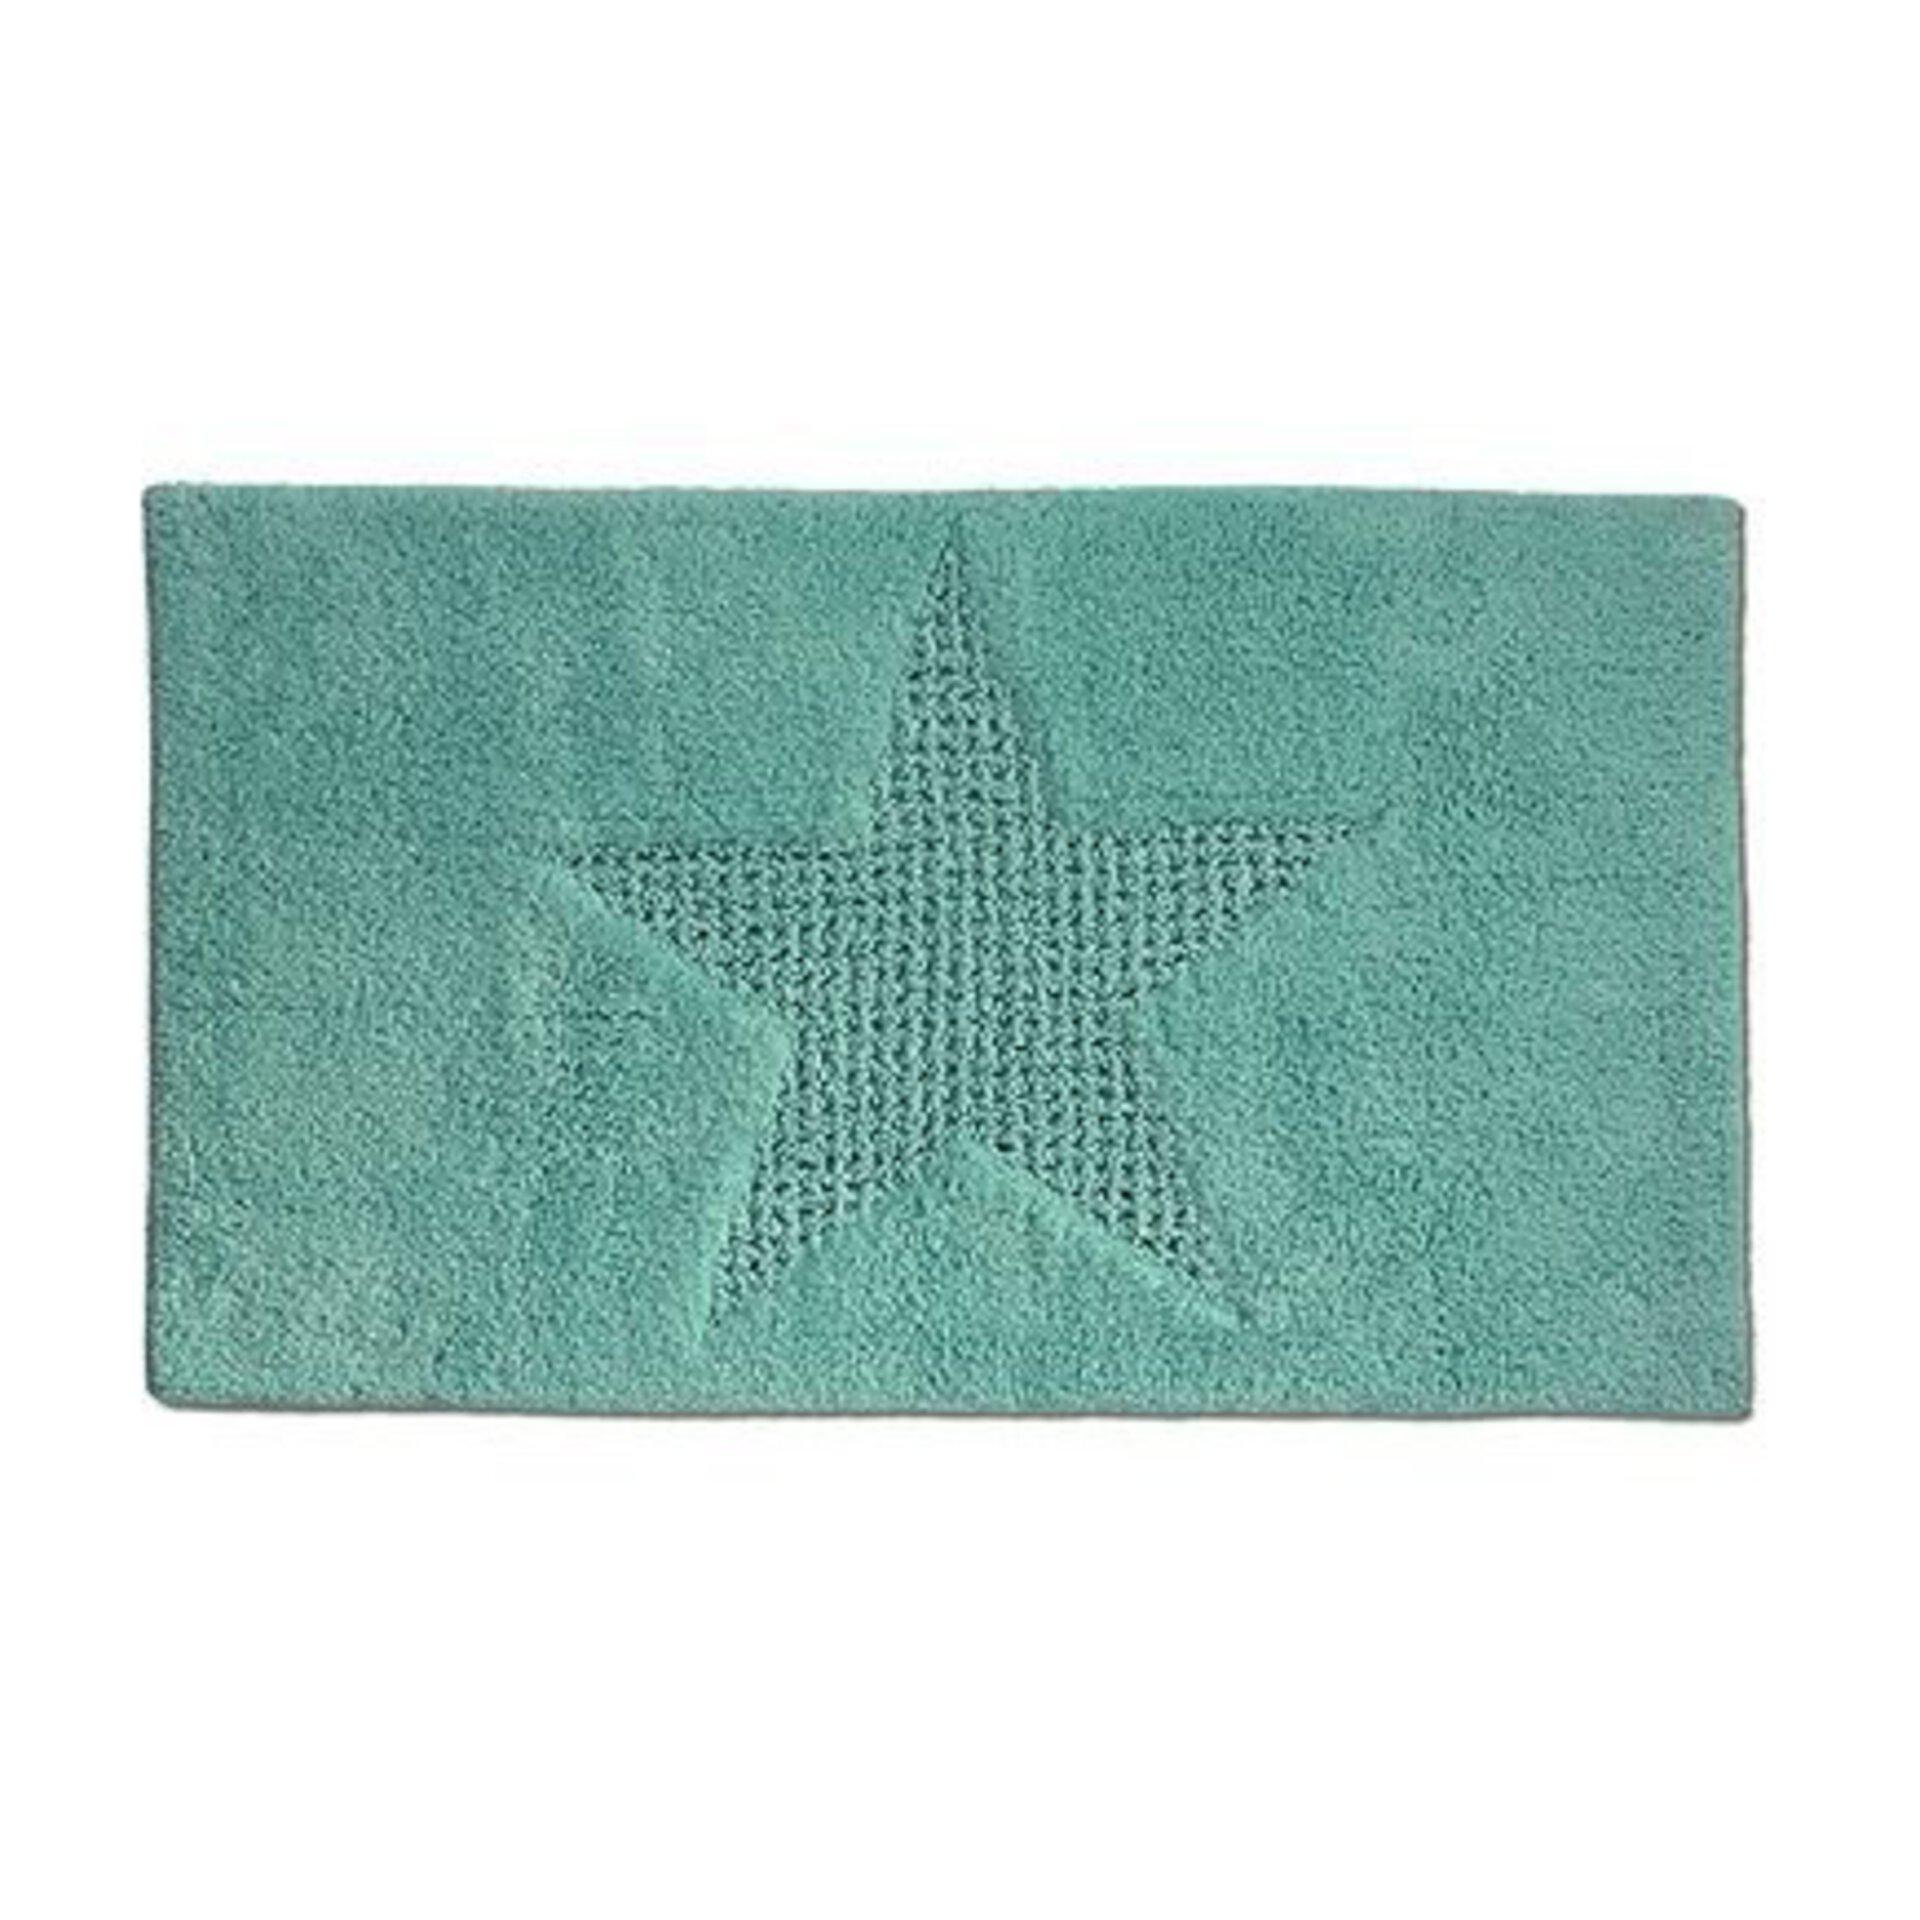 Badteppich Lindano Kela Textil grün